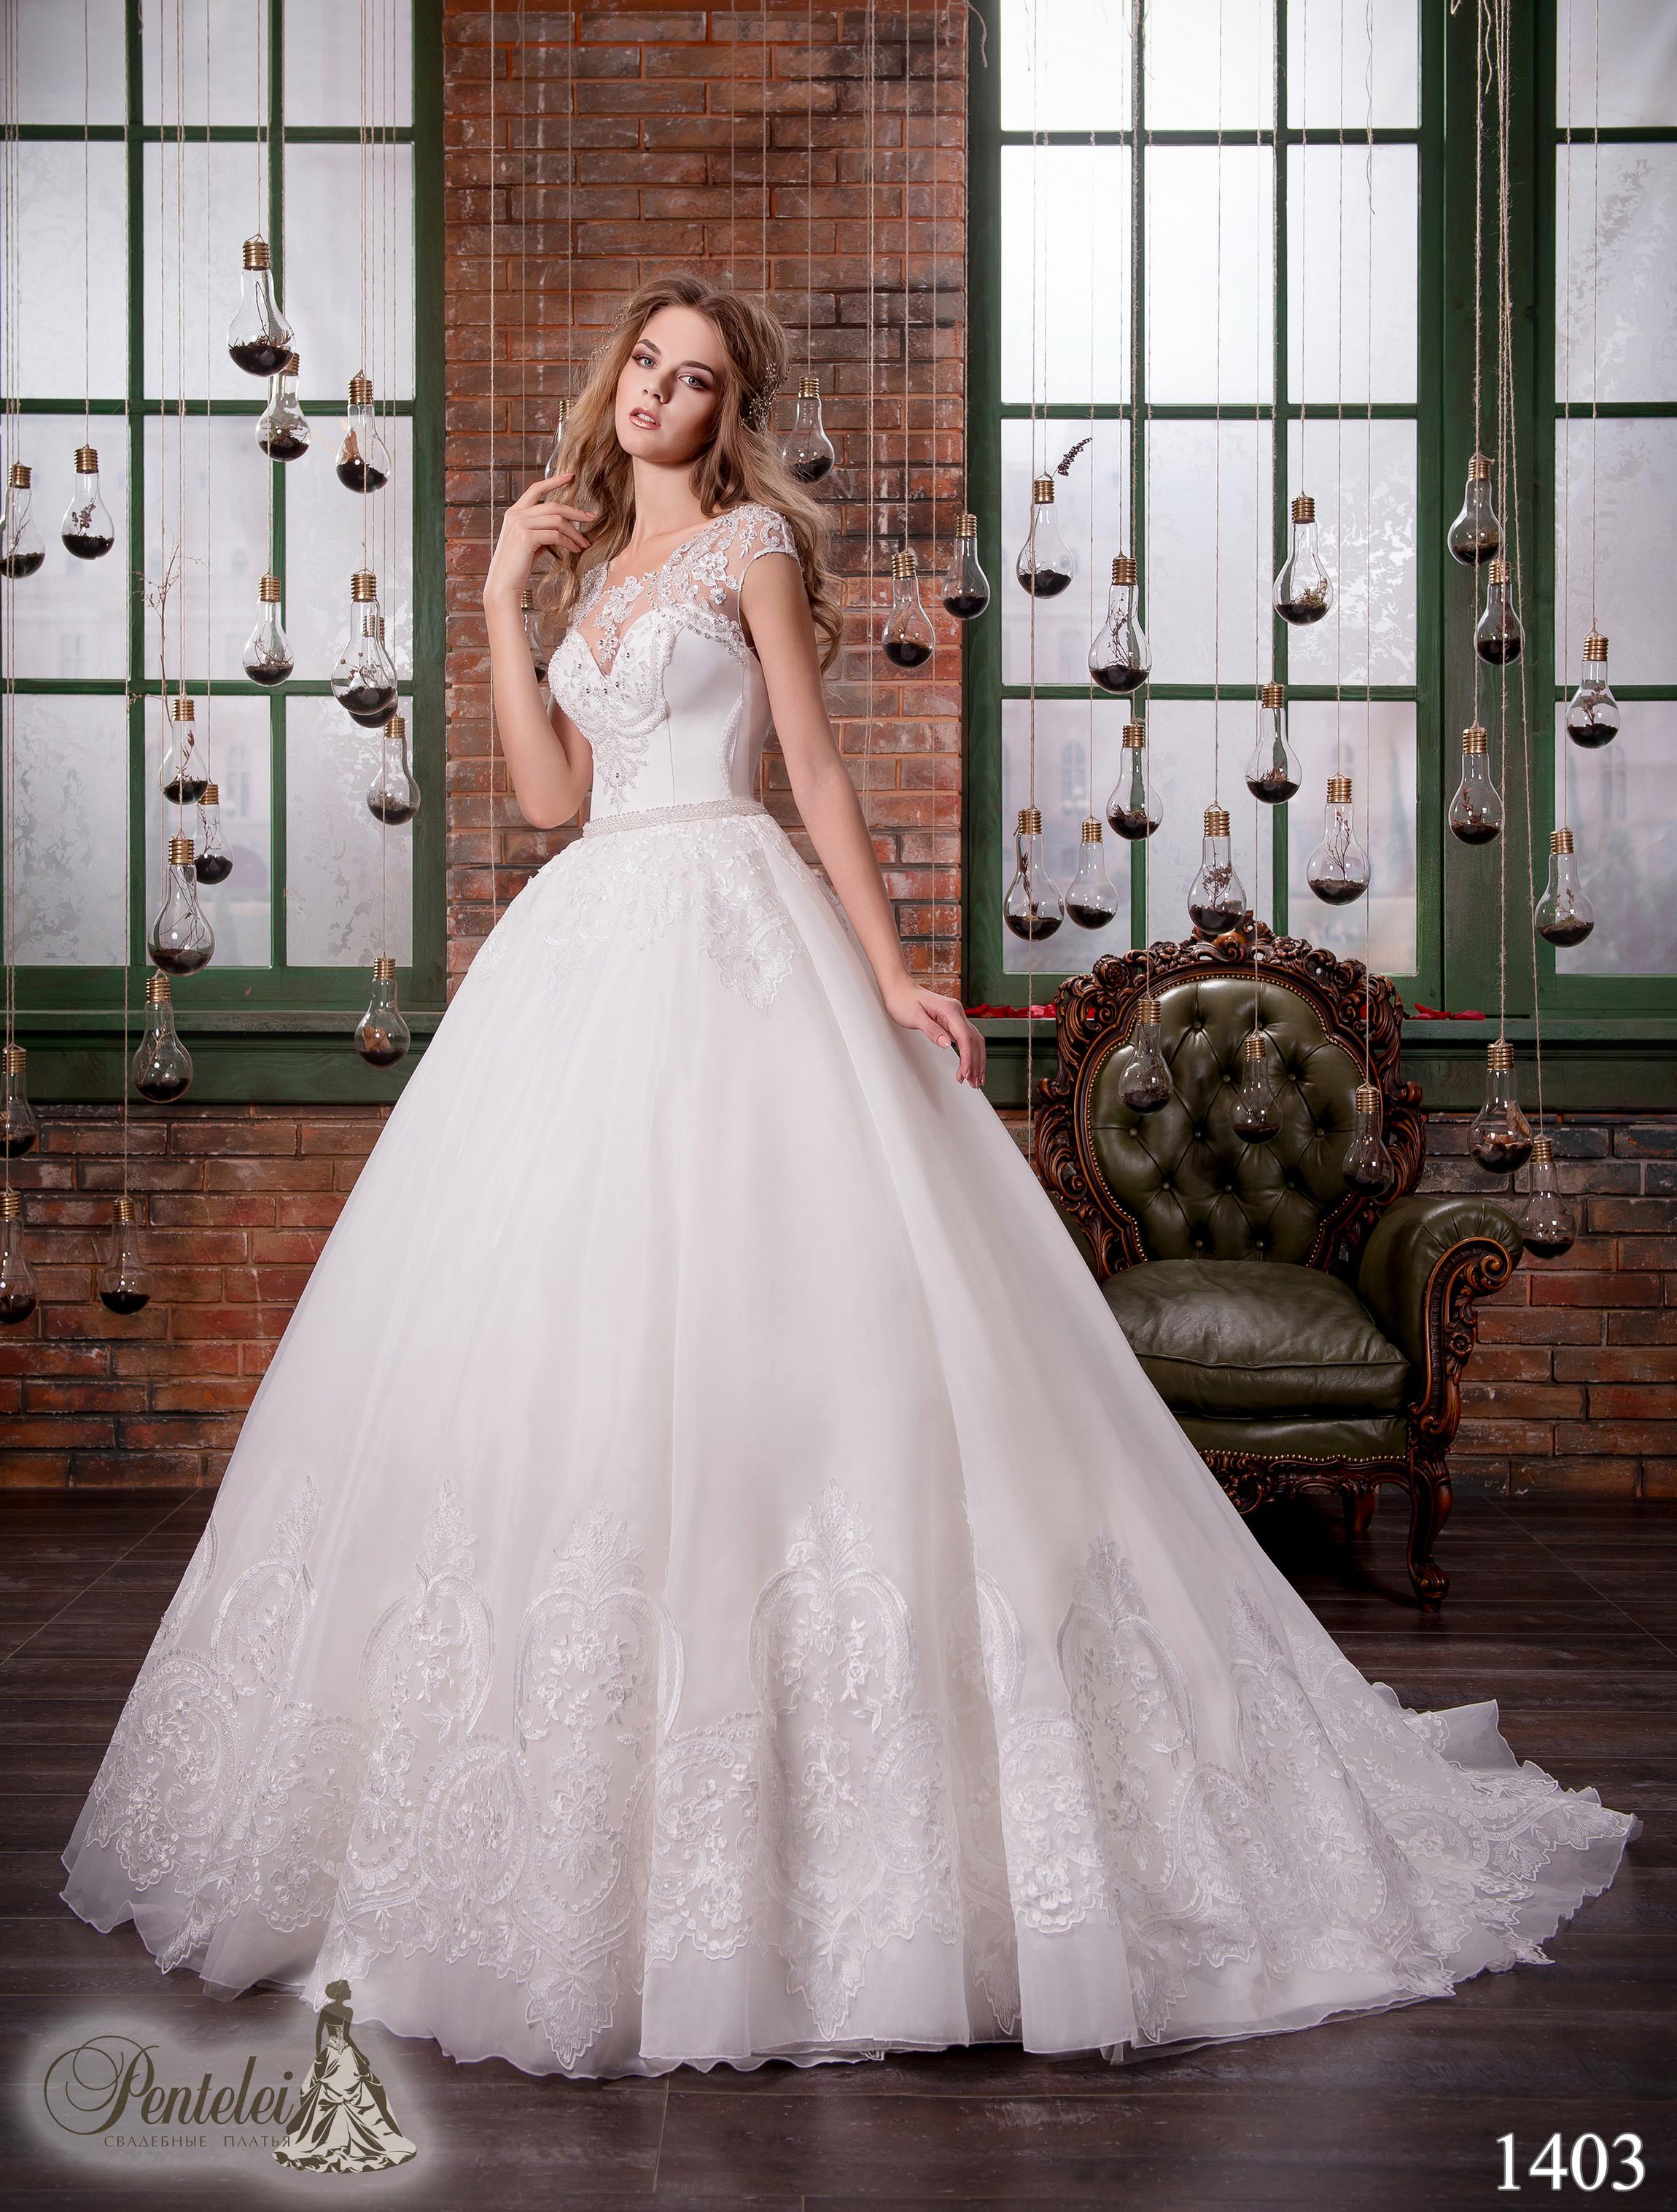 1403 | Buy wedding dresses wholesale from Pentelei